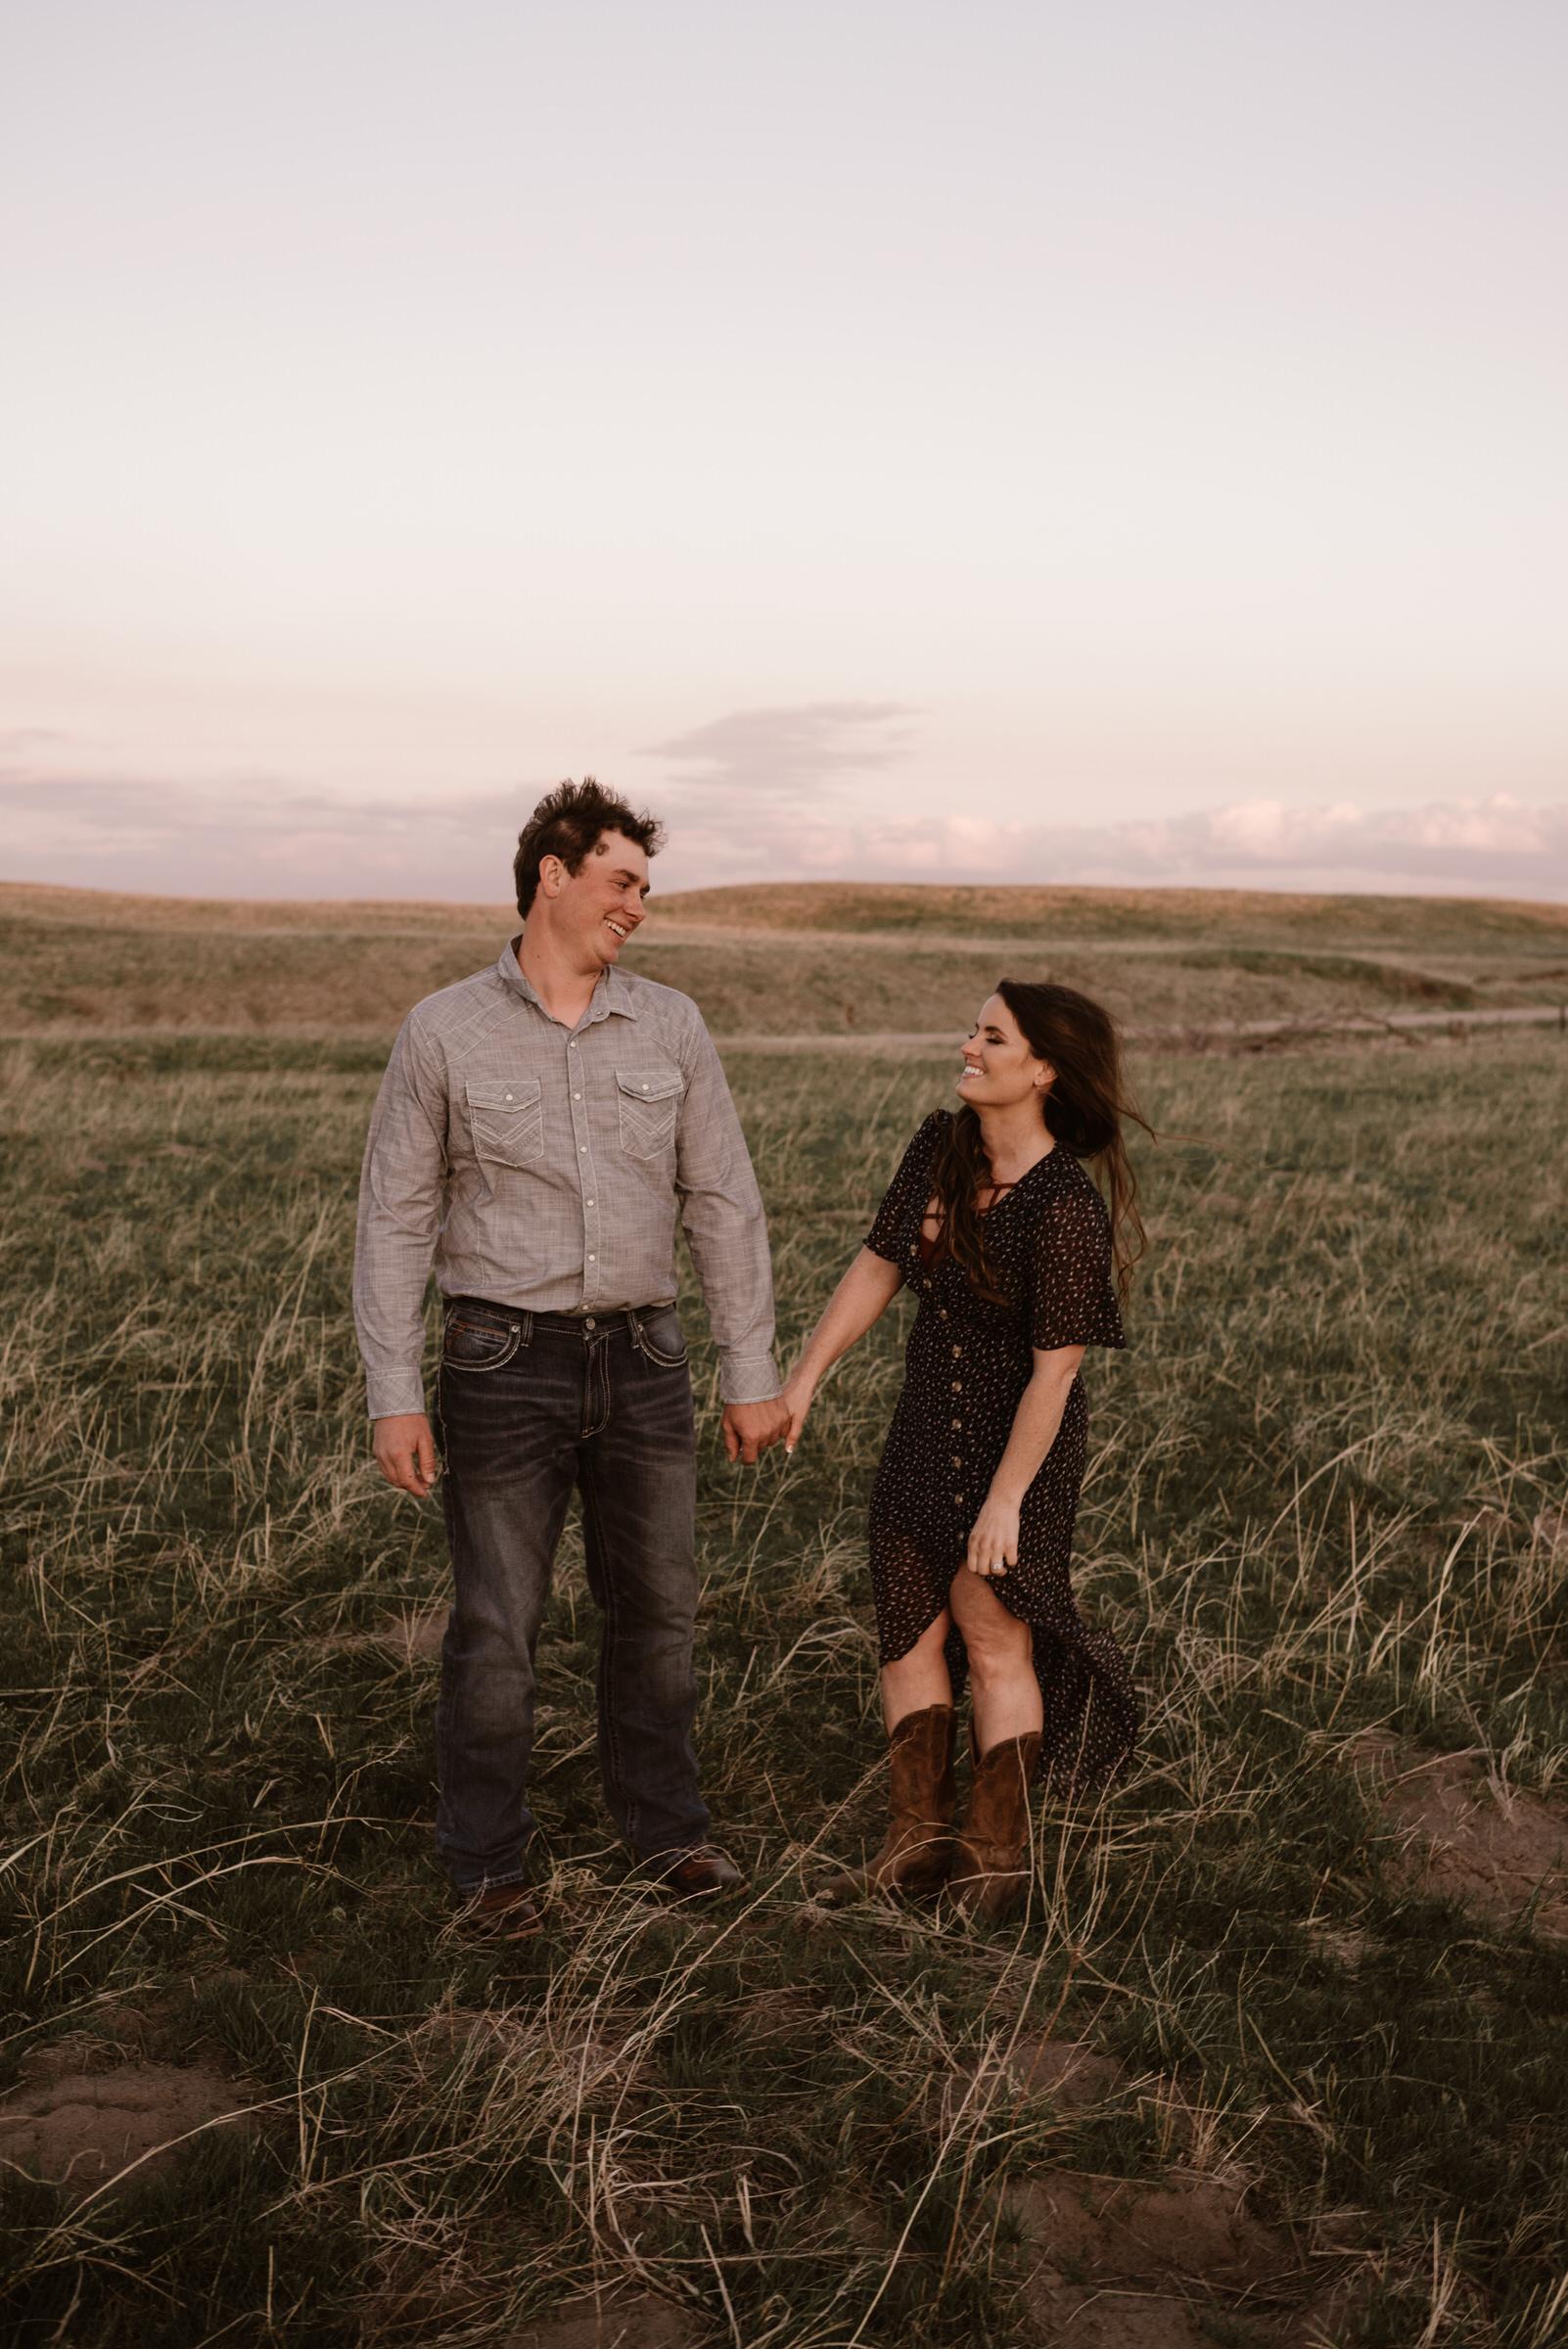 Sandhills-Nebraska-Engagement-Wedding-Photographer-Kaylie-Sirek-Photography-044.jpg